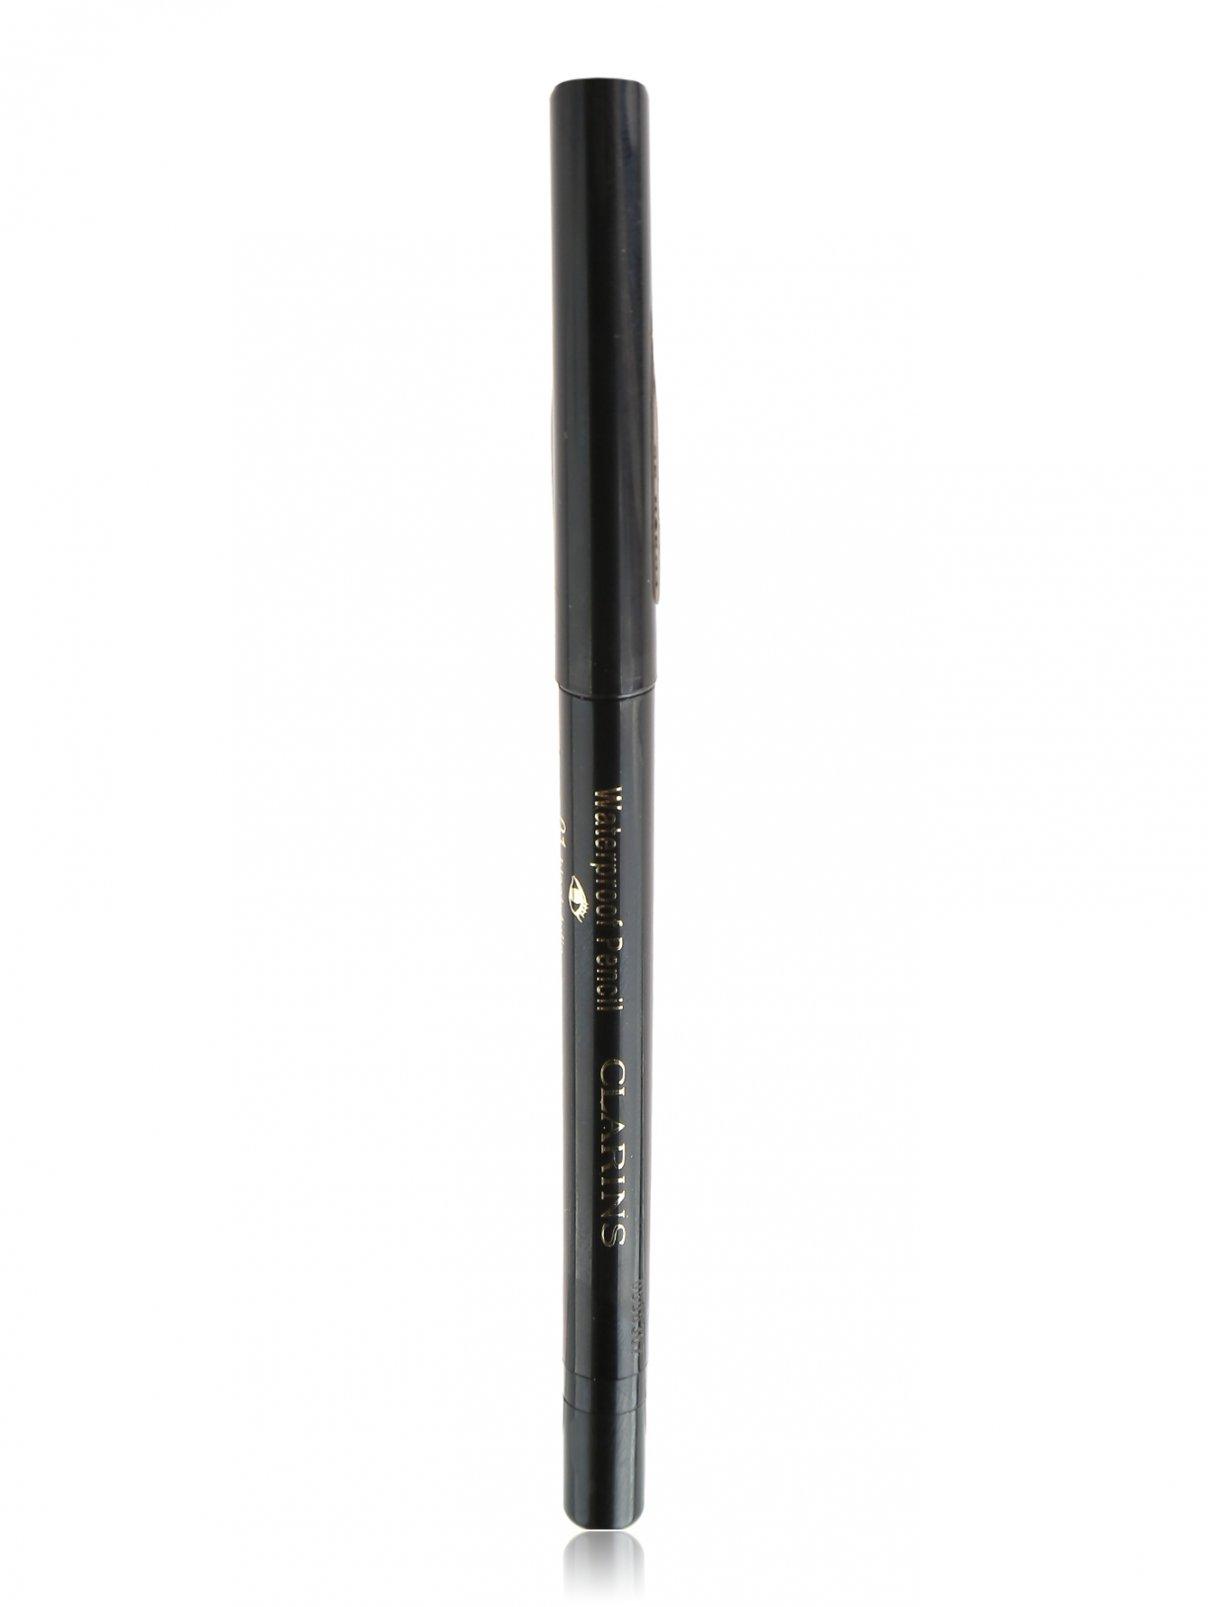 Карандаш для глаз Waterproof Pencil 04 Makeup Clarins  –  Общий вид